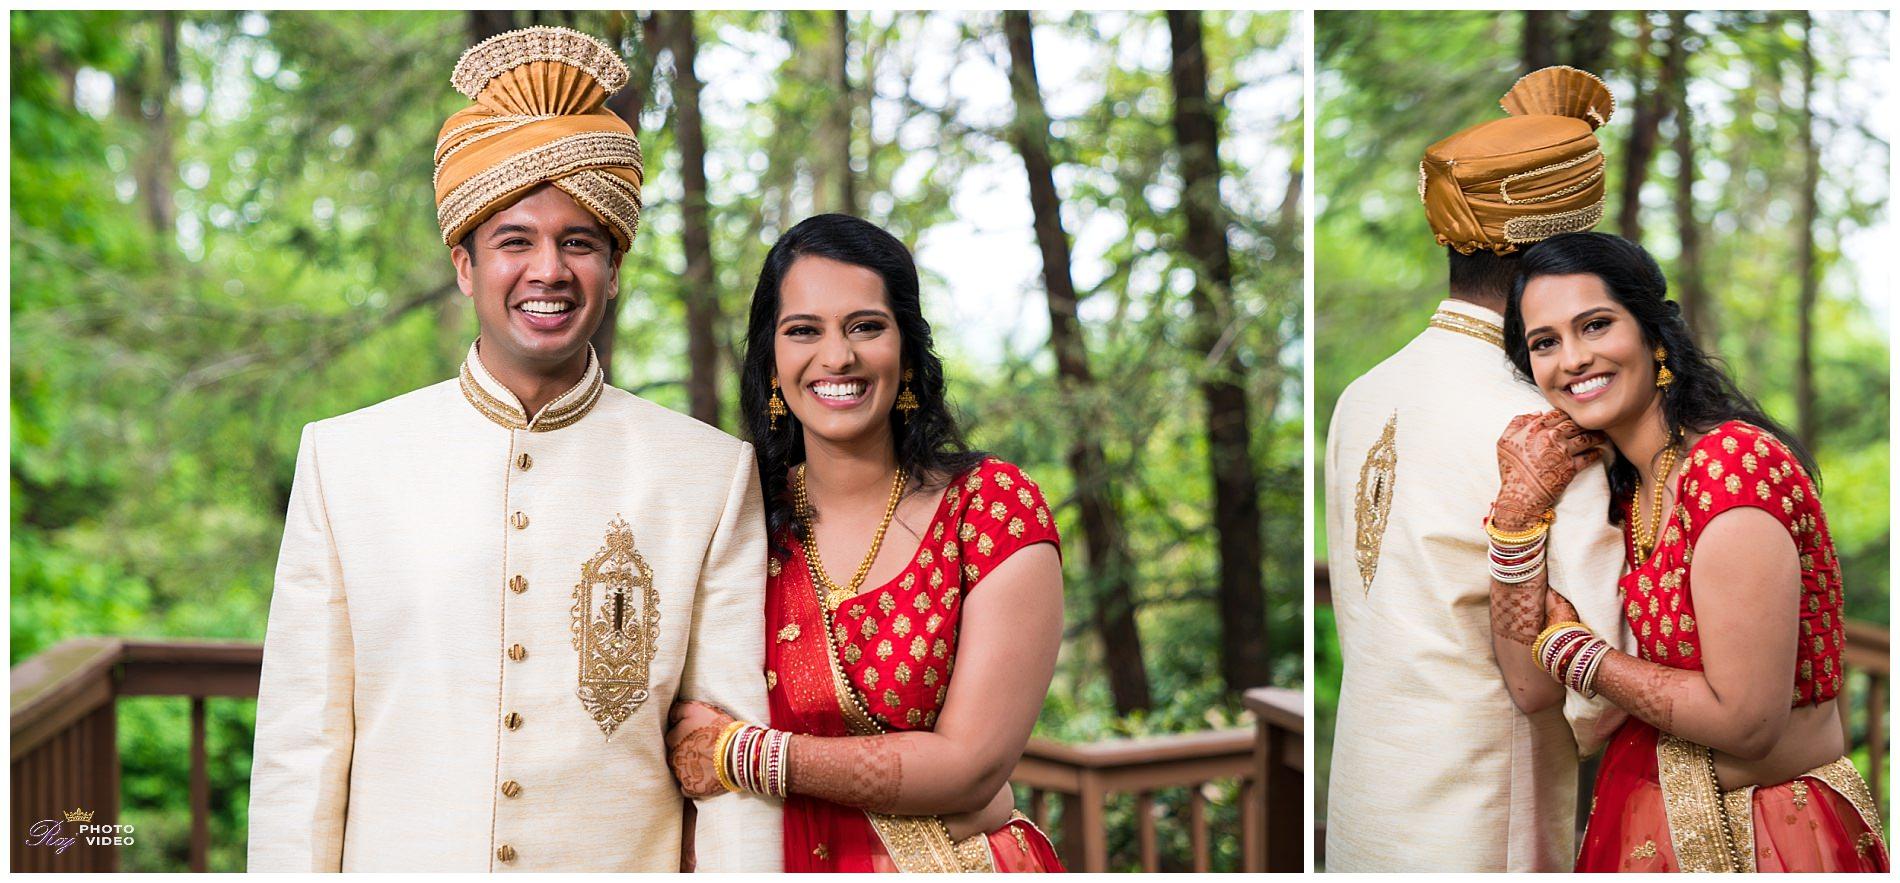 Martinsville-Gardens-NJ-Indian-Wedding-Ruchi-Vishal-8.jpg